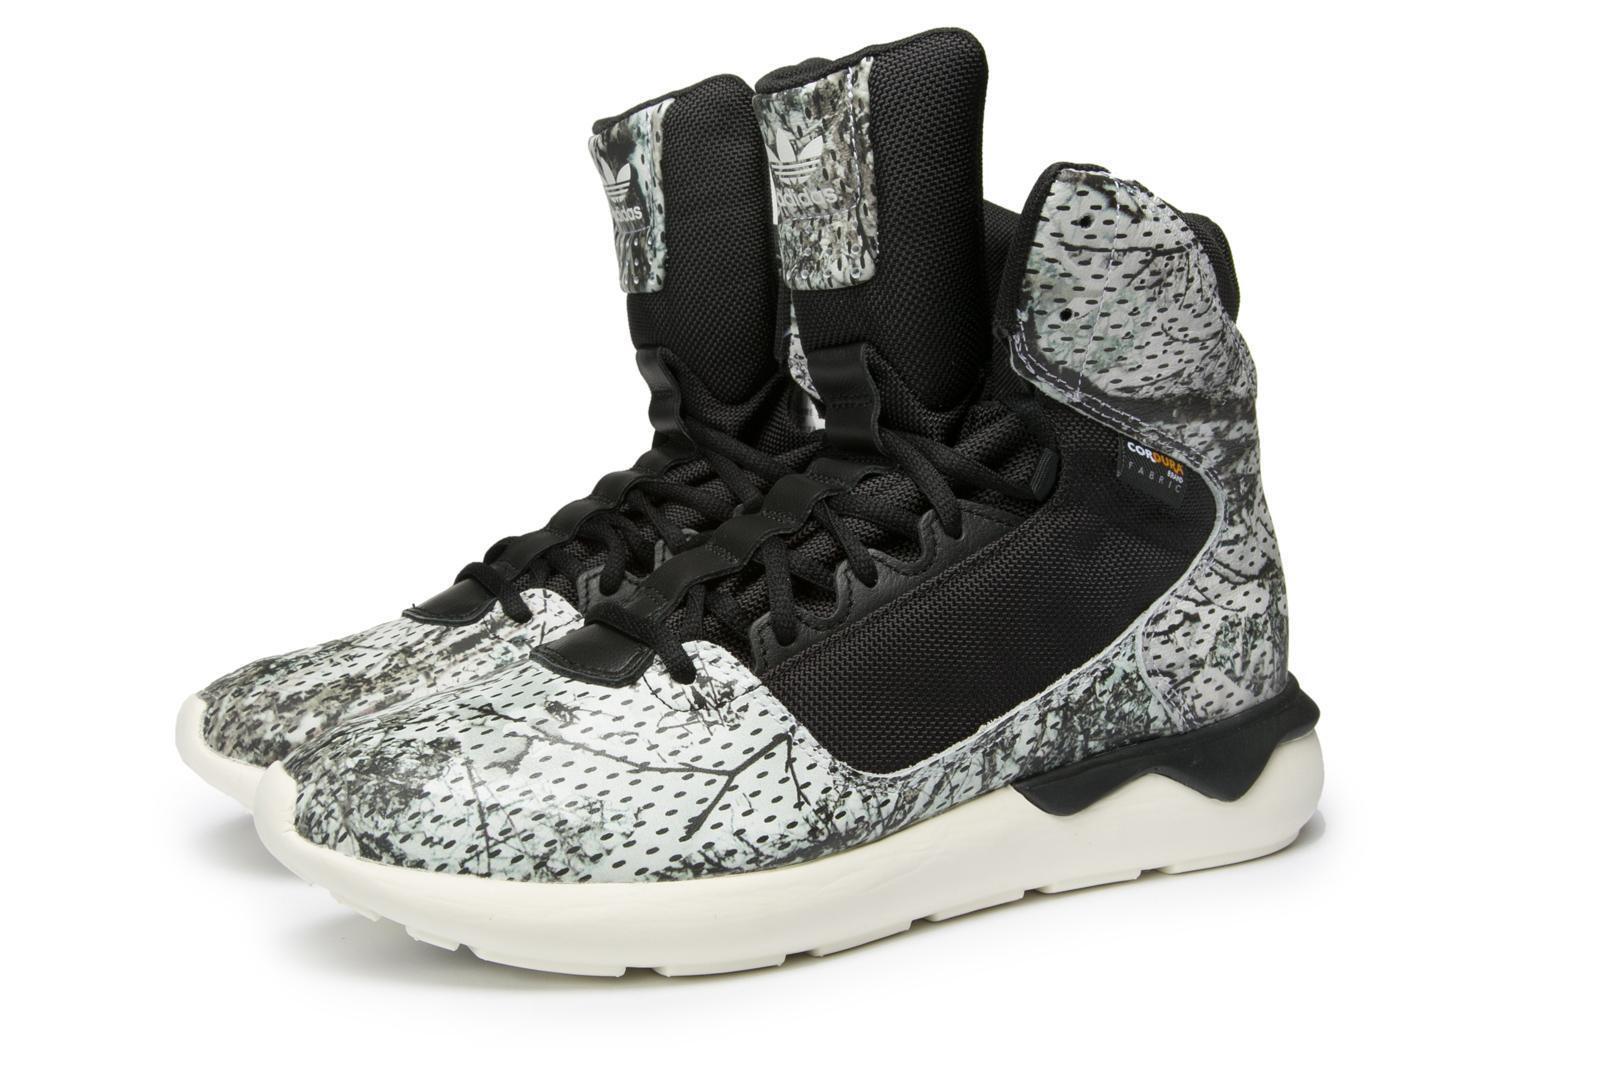 Adidas Originals Men's Tubular GSG9 Shoes Size 8.5 us S82515